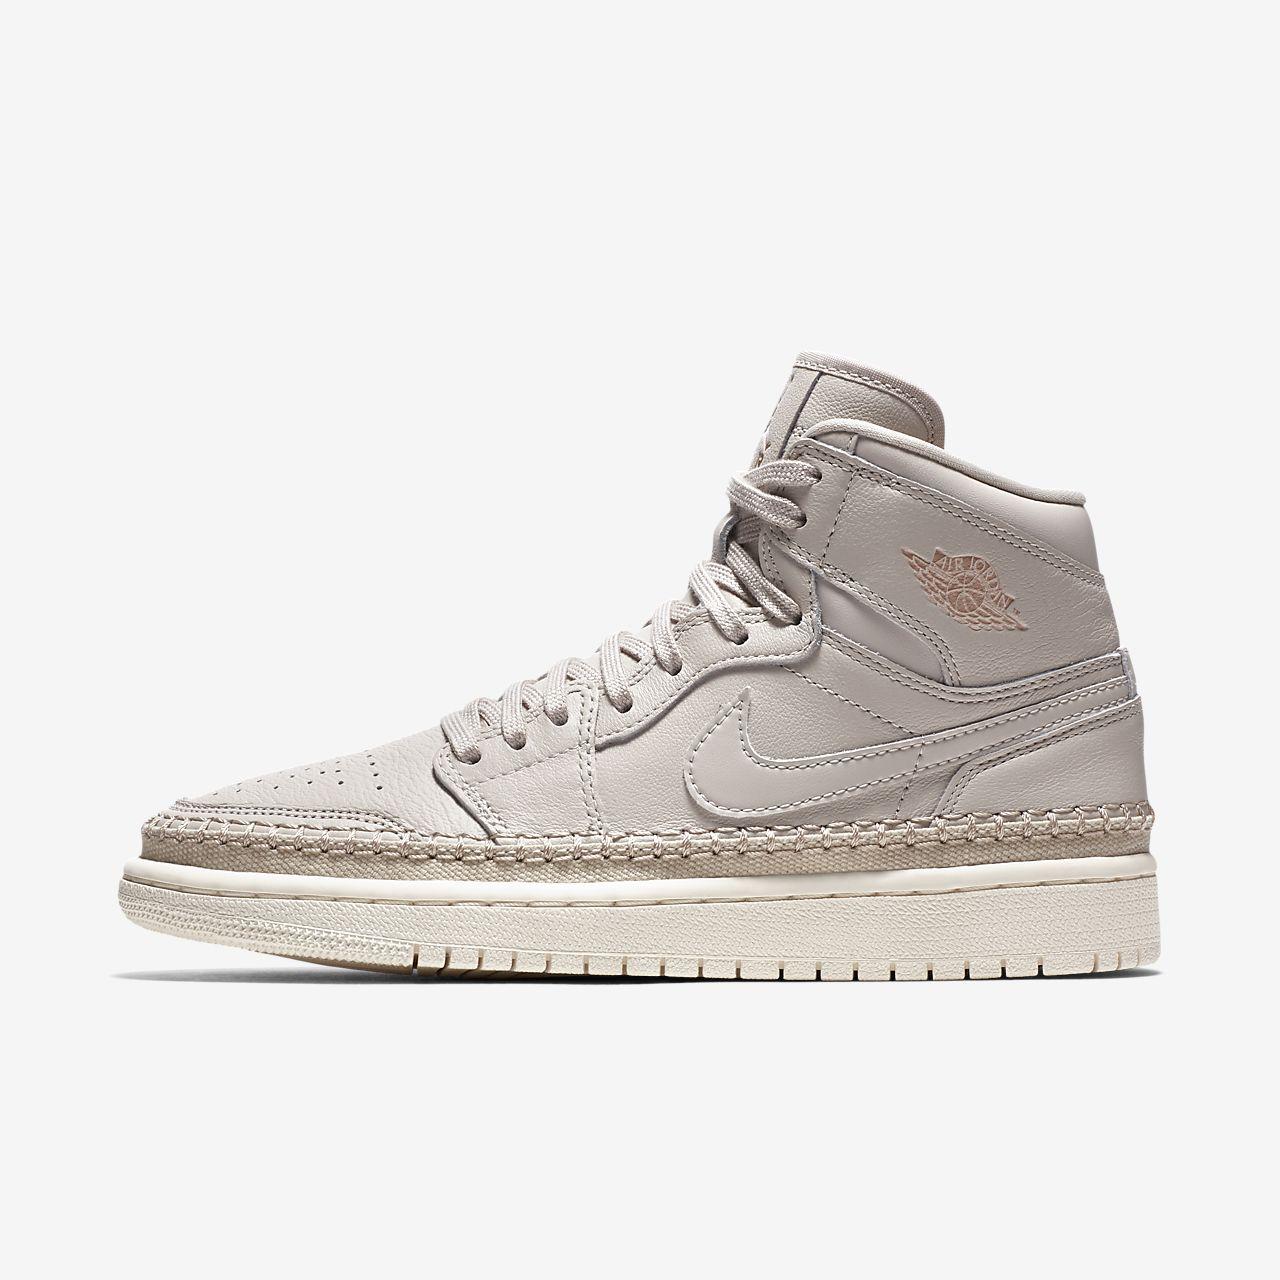 more photos 941f0 0d3dc Sko Nike Air Jordan 1 Retro High Premium för kvinnor